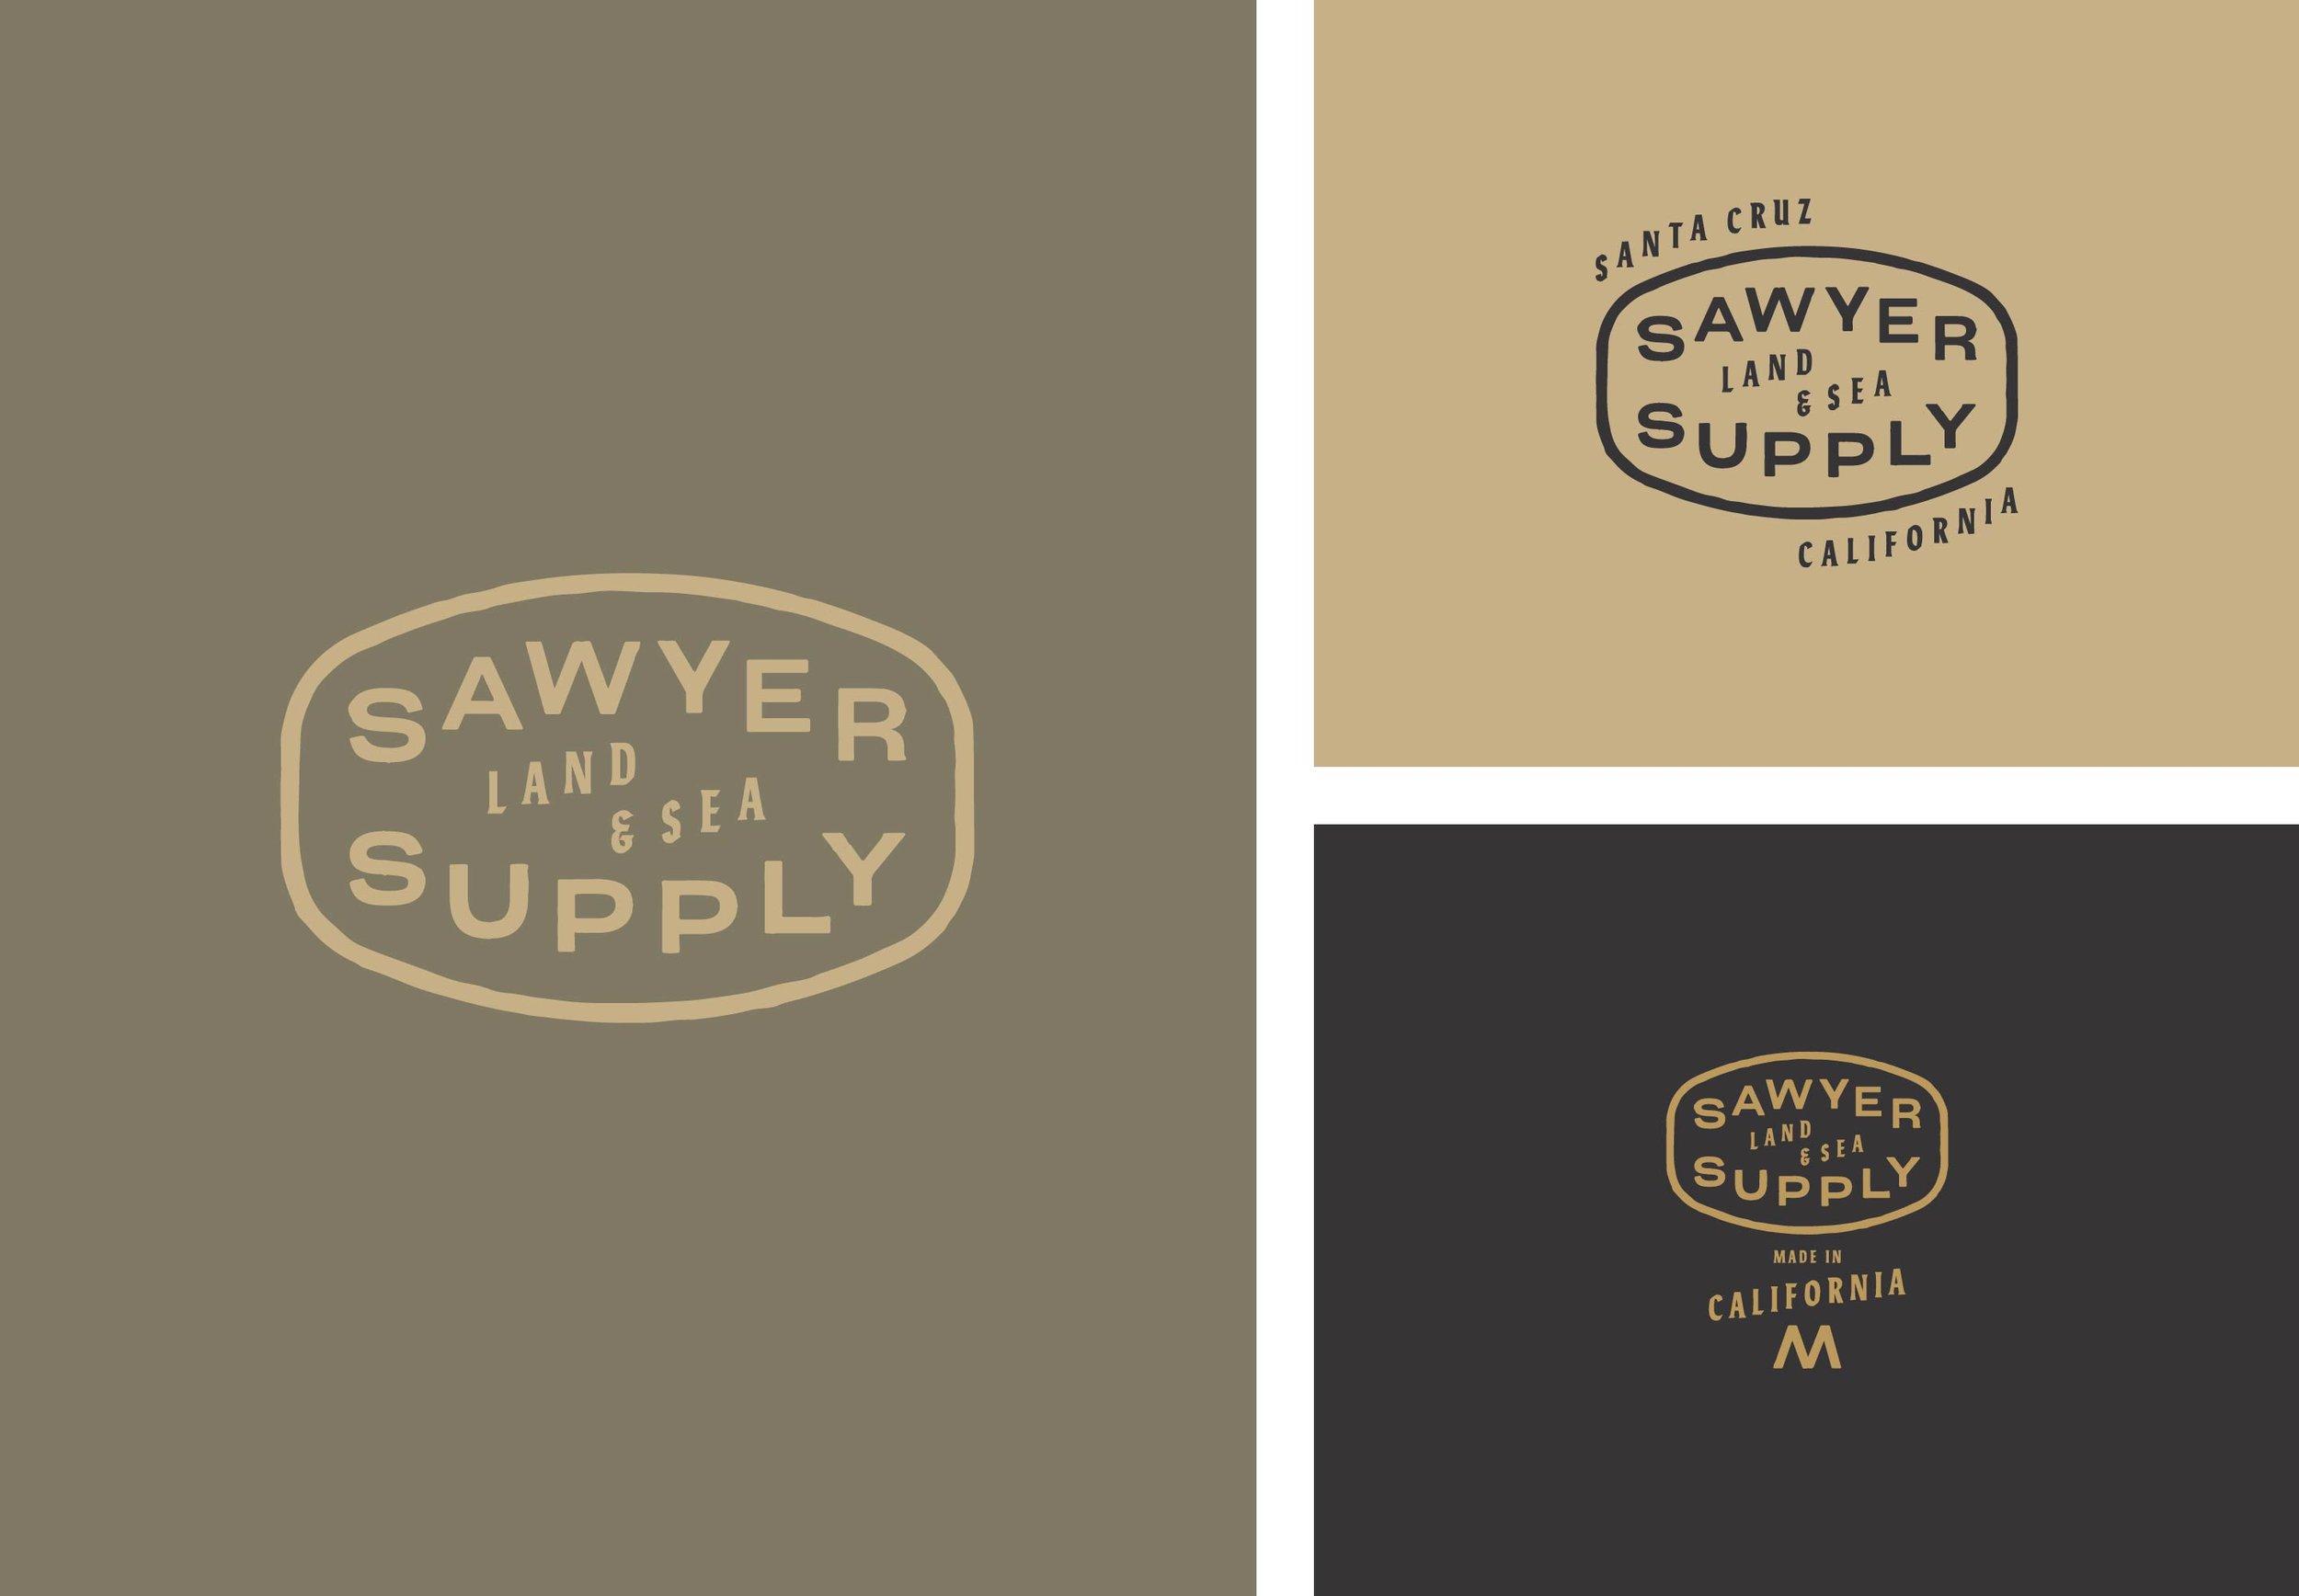 SawyerSupply_1.jpg